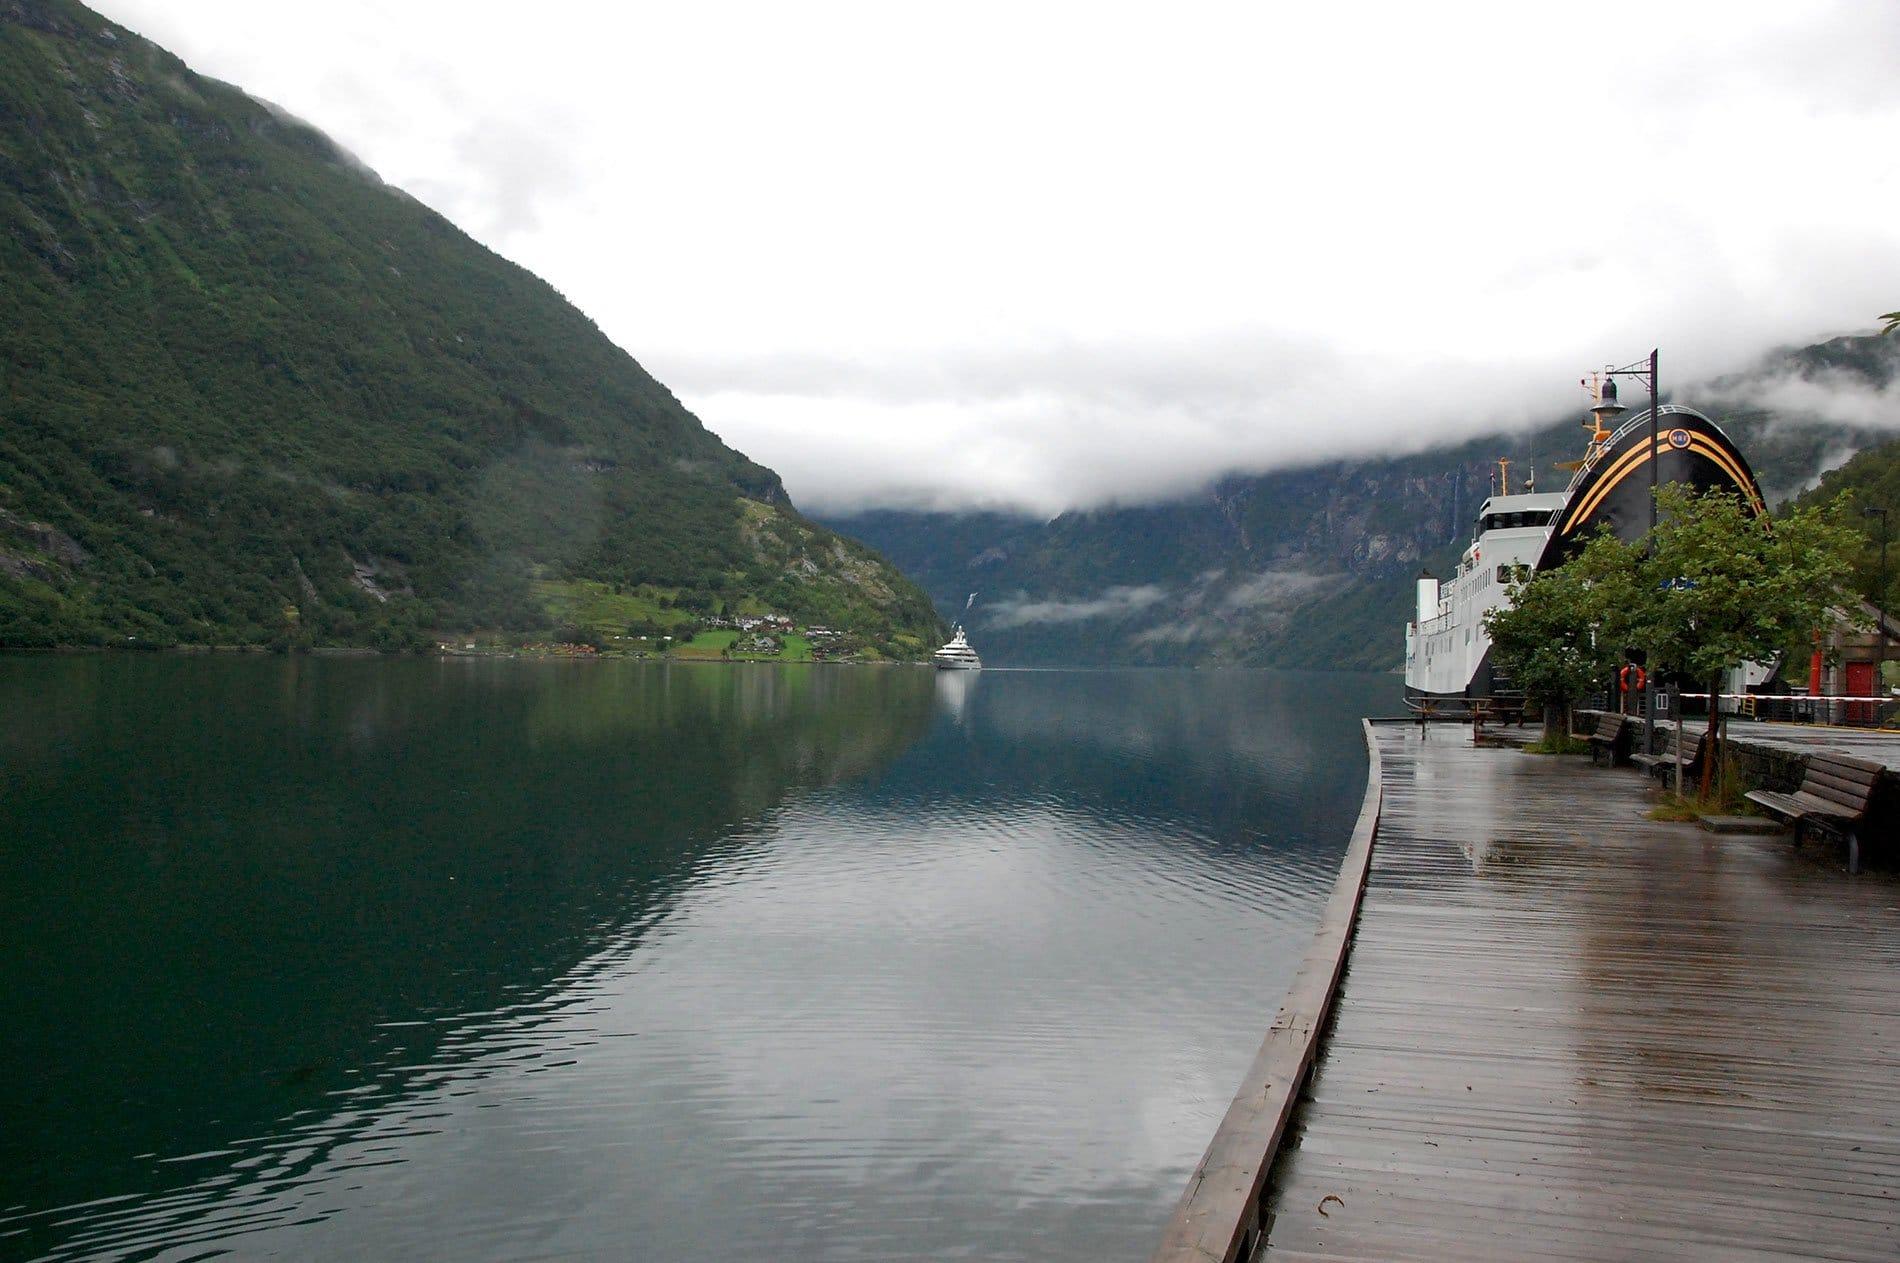 Voyage en Norvège, le Geirangerfjord - 22 v'la Scarlett